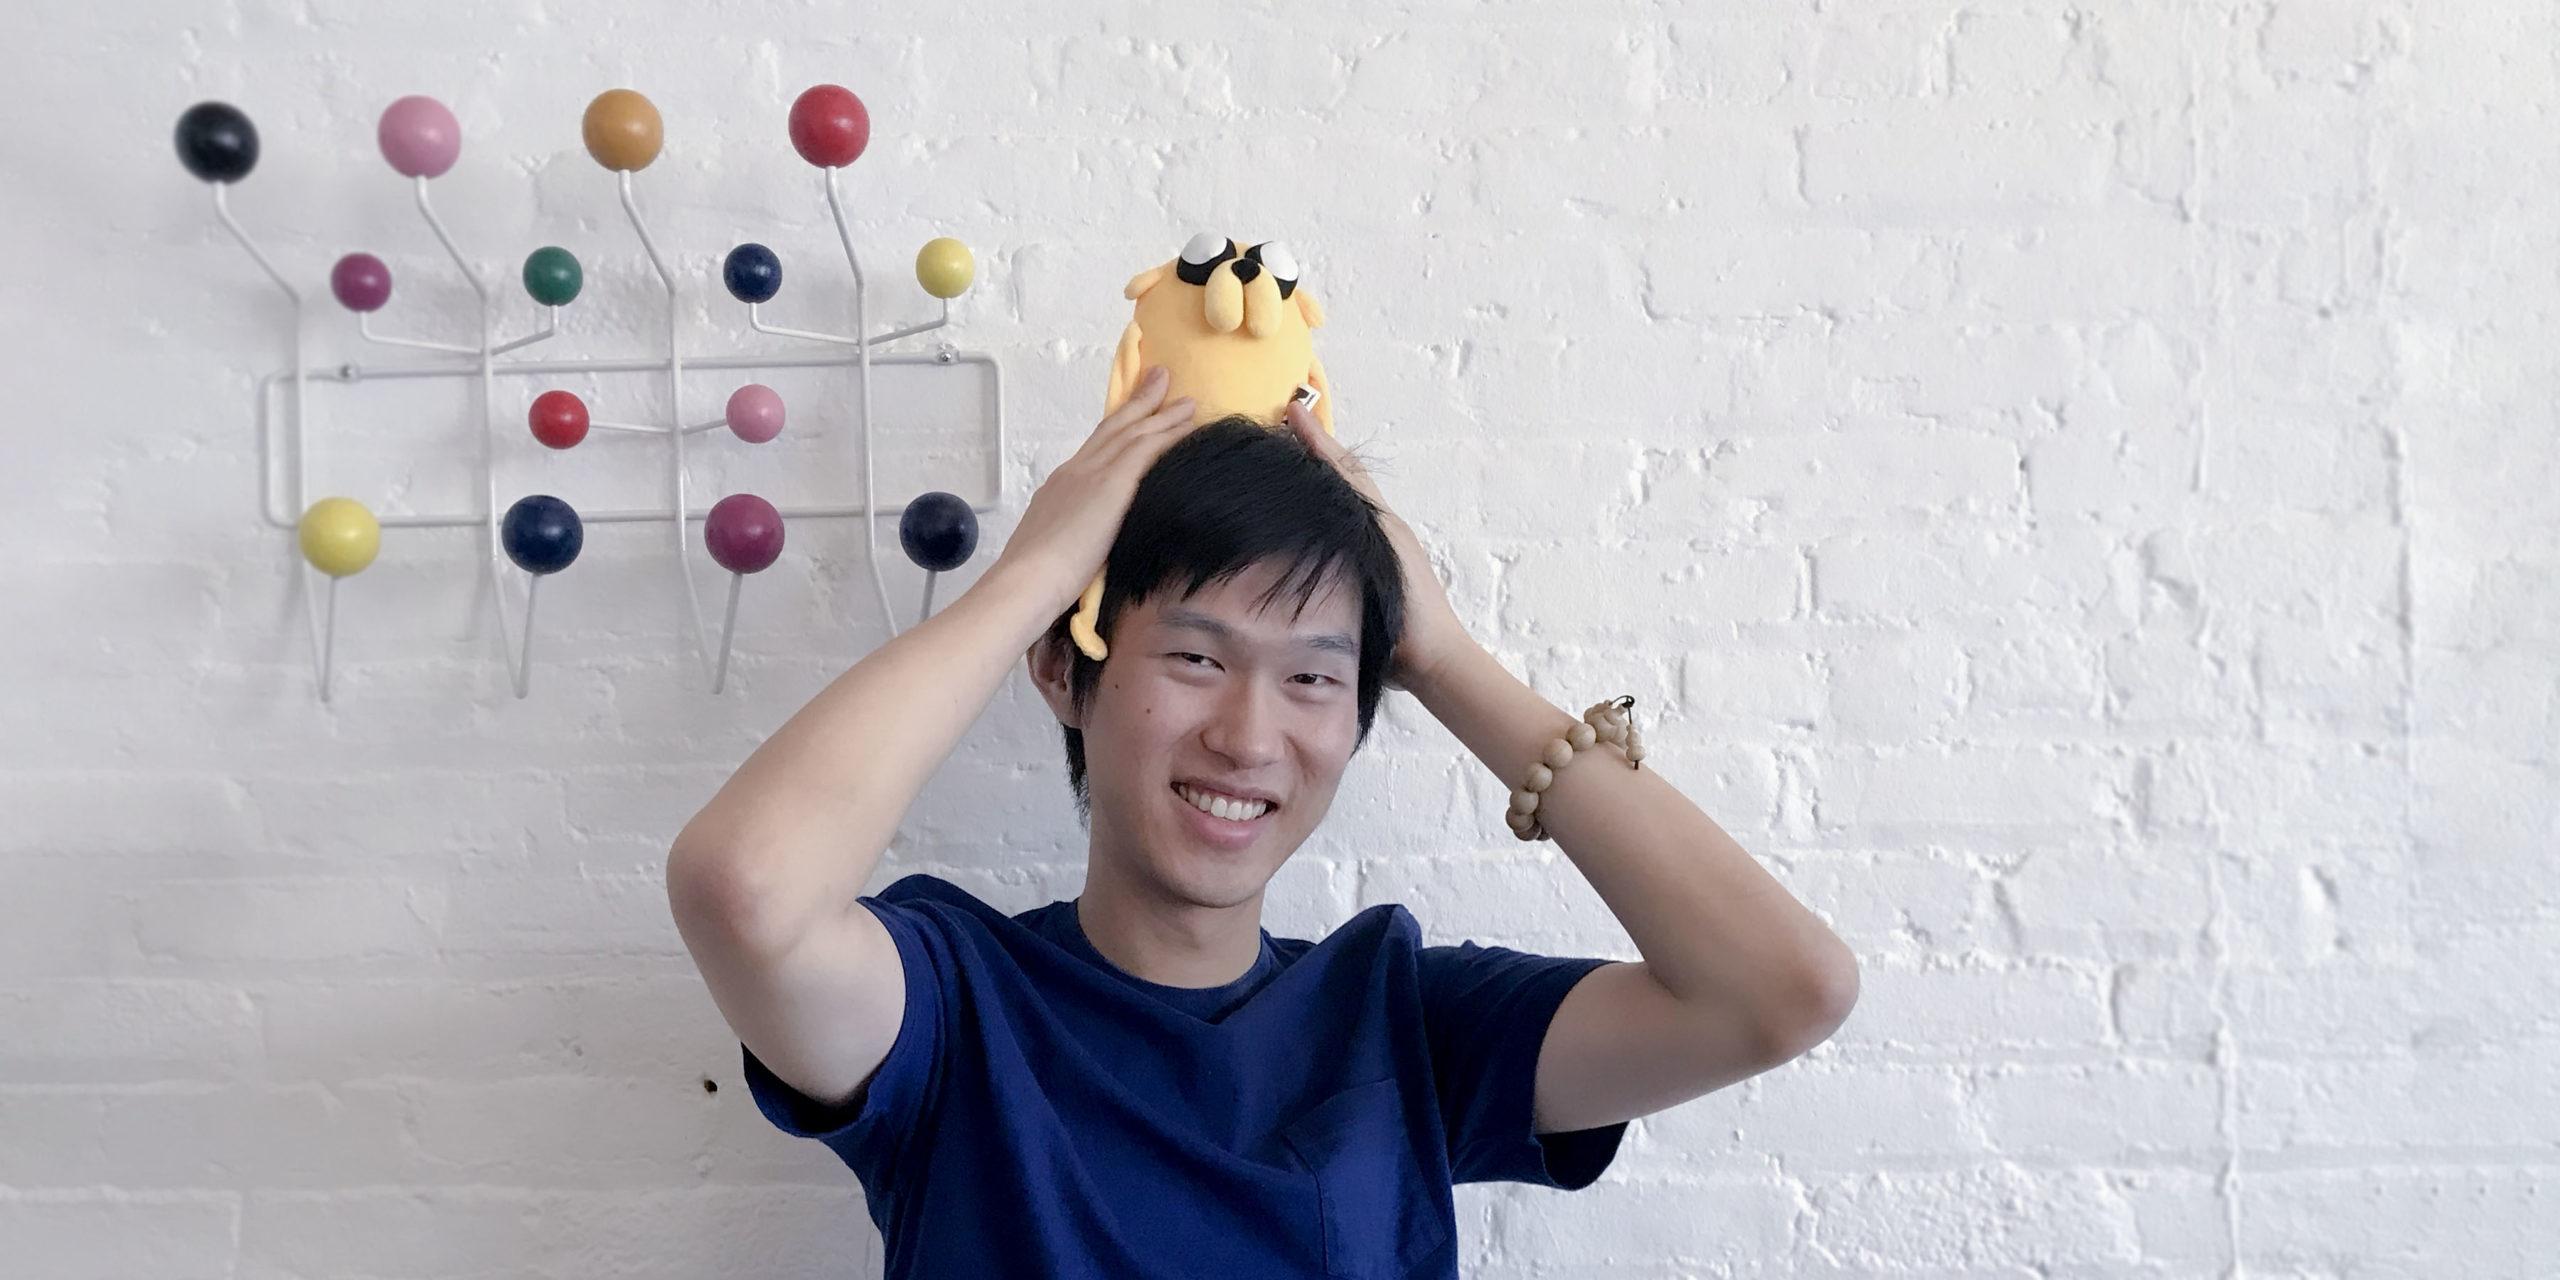 Yingda Xu poses with plush toy